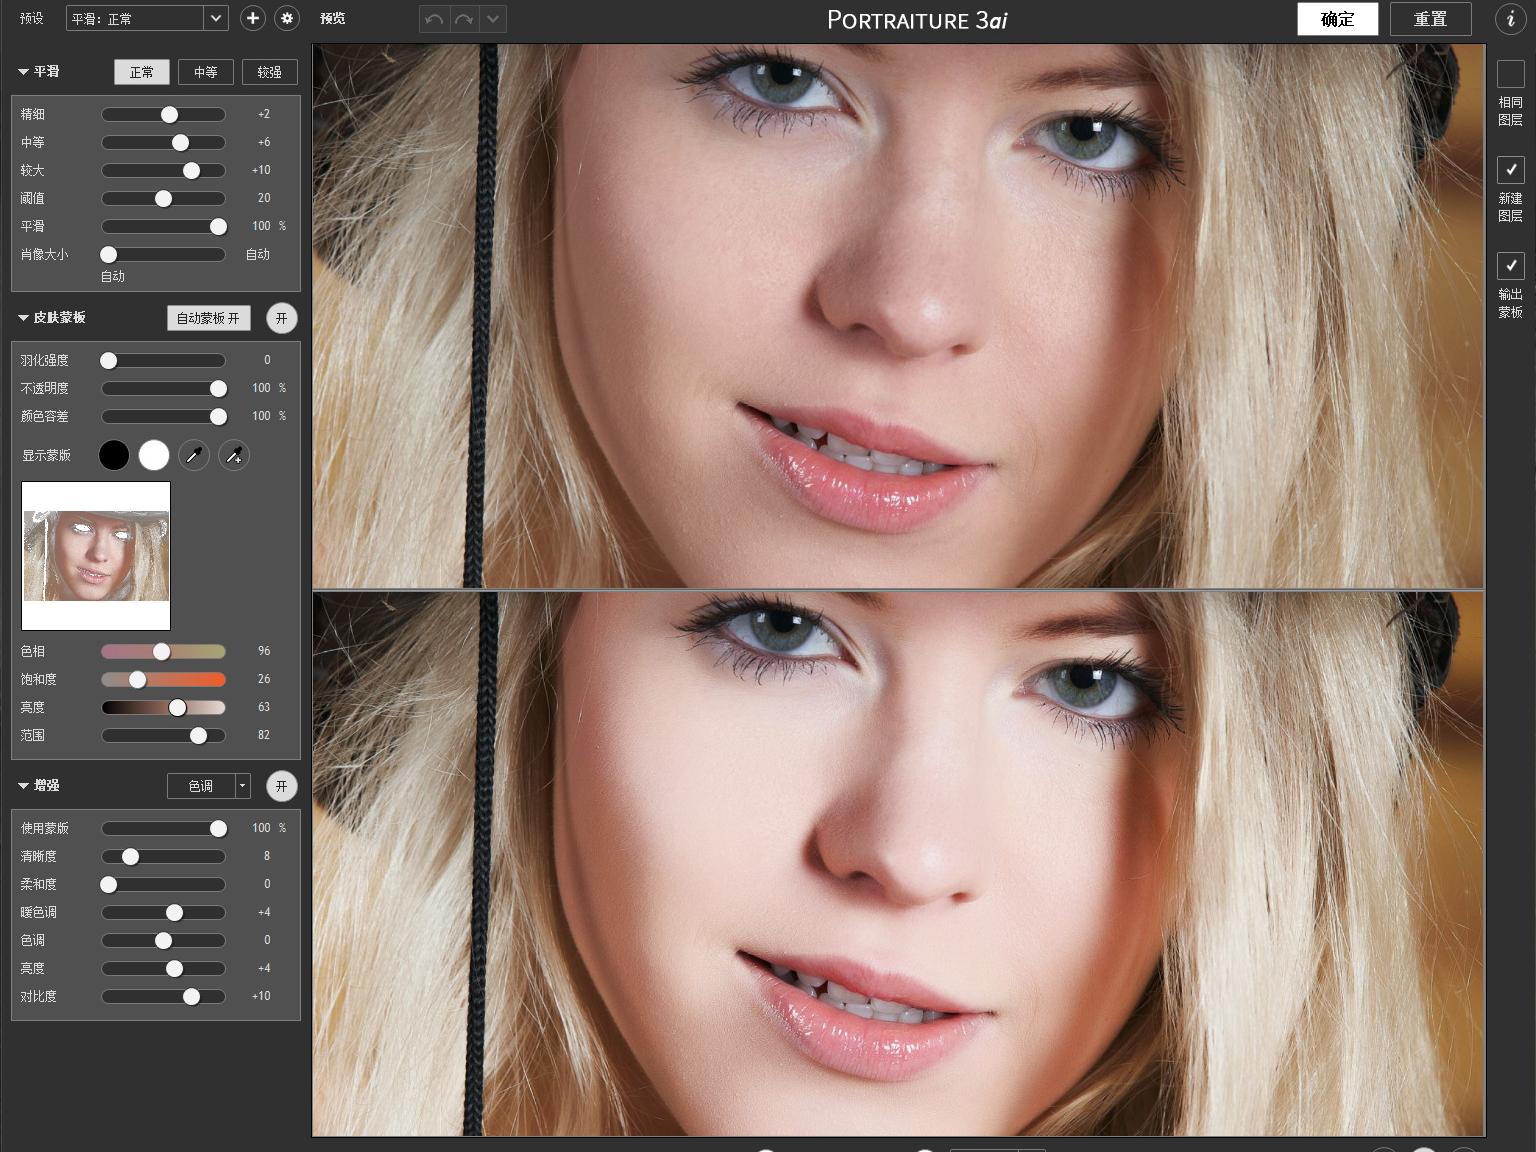 PS/LR人像美容插件 Imagenomic Portraiture 3.5.4 Build 3546